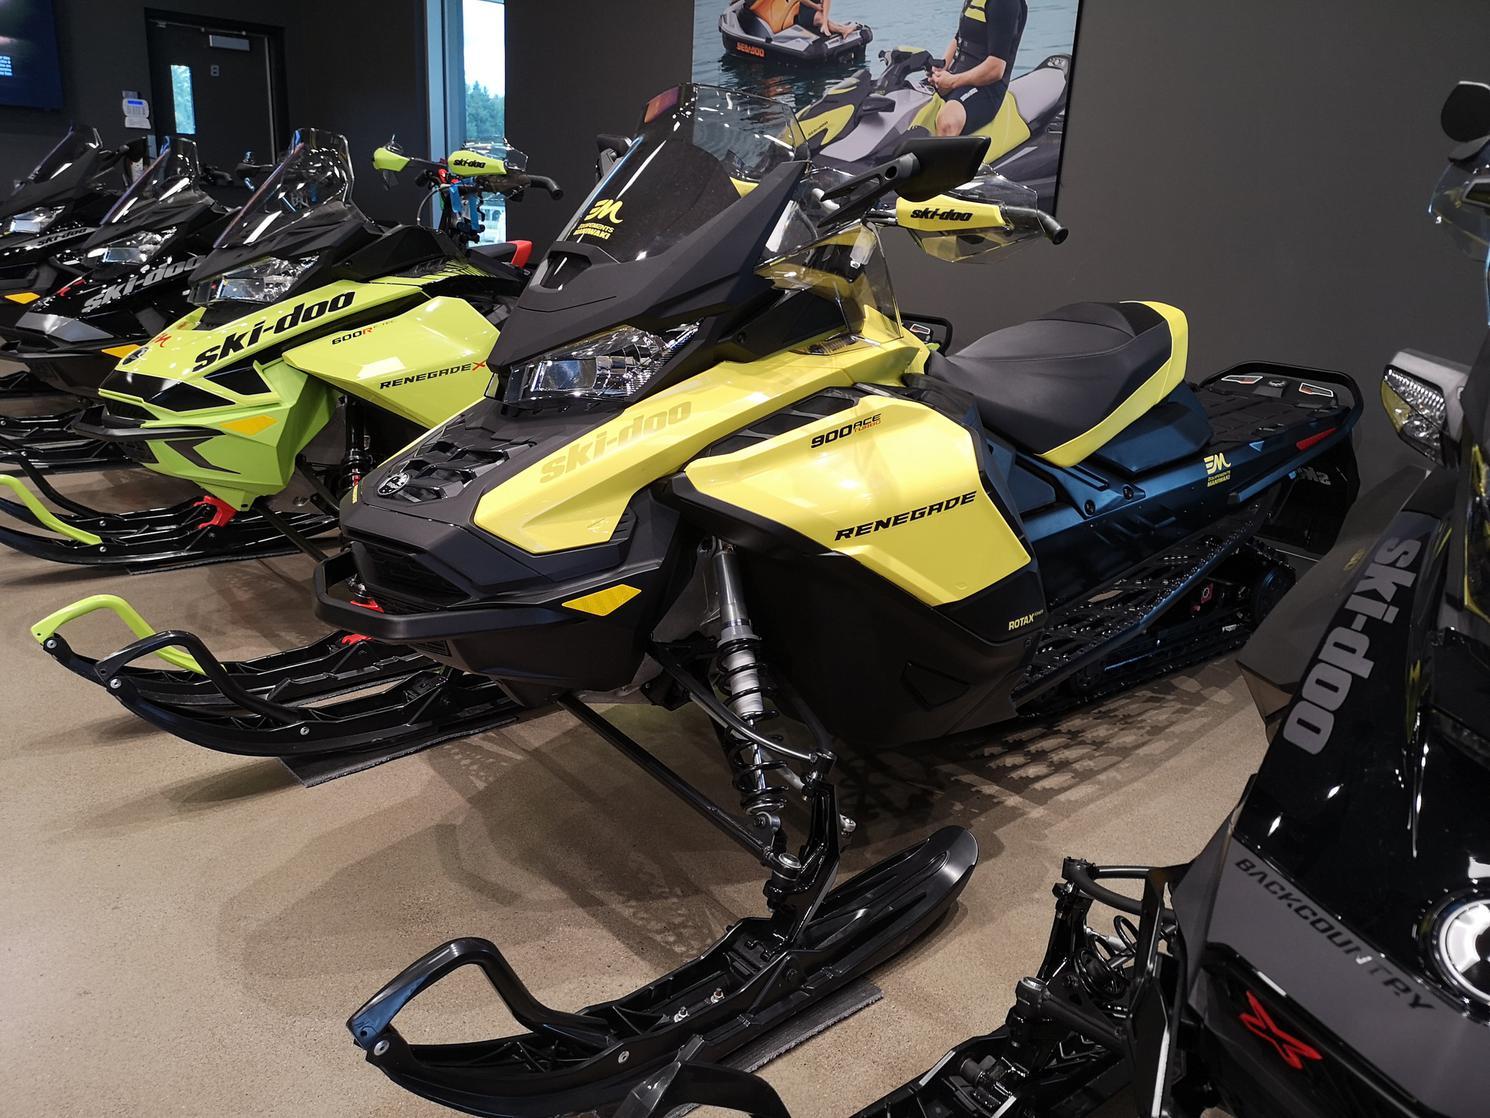 2021 Ski-Doo Renegade adrenaline 900 turbo